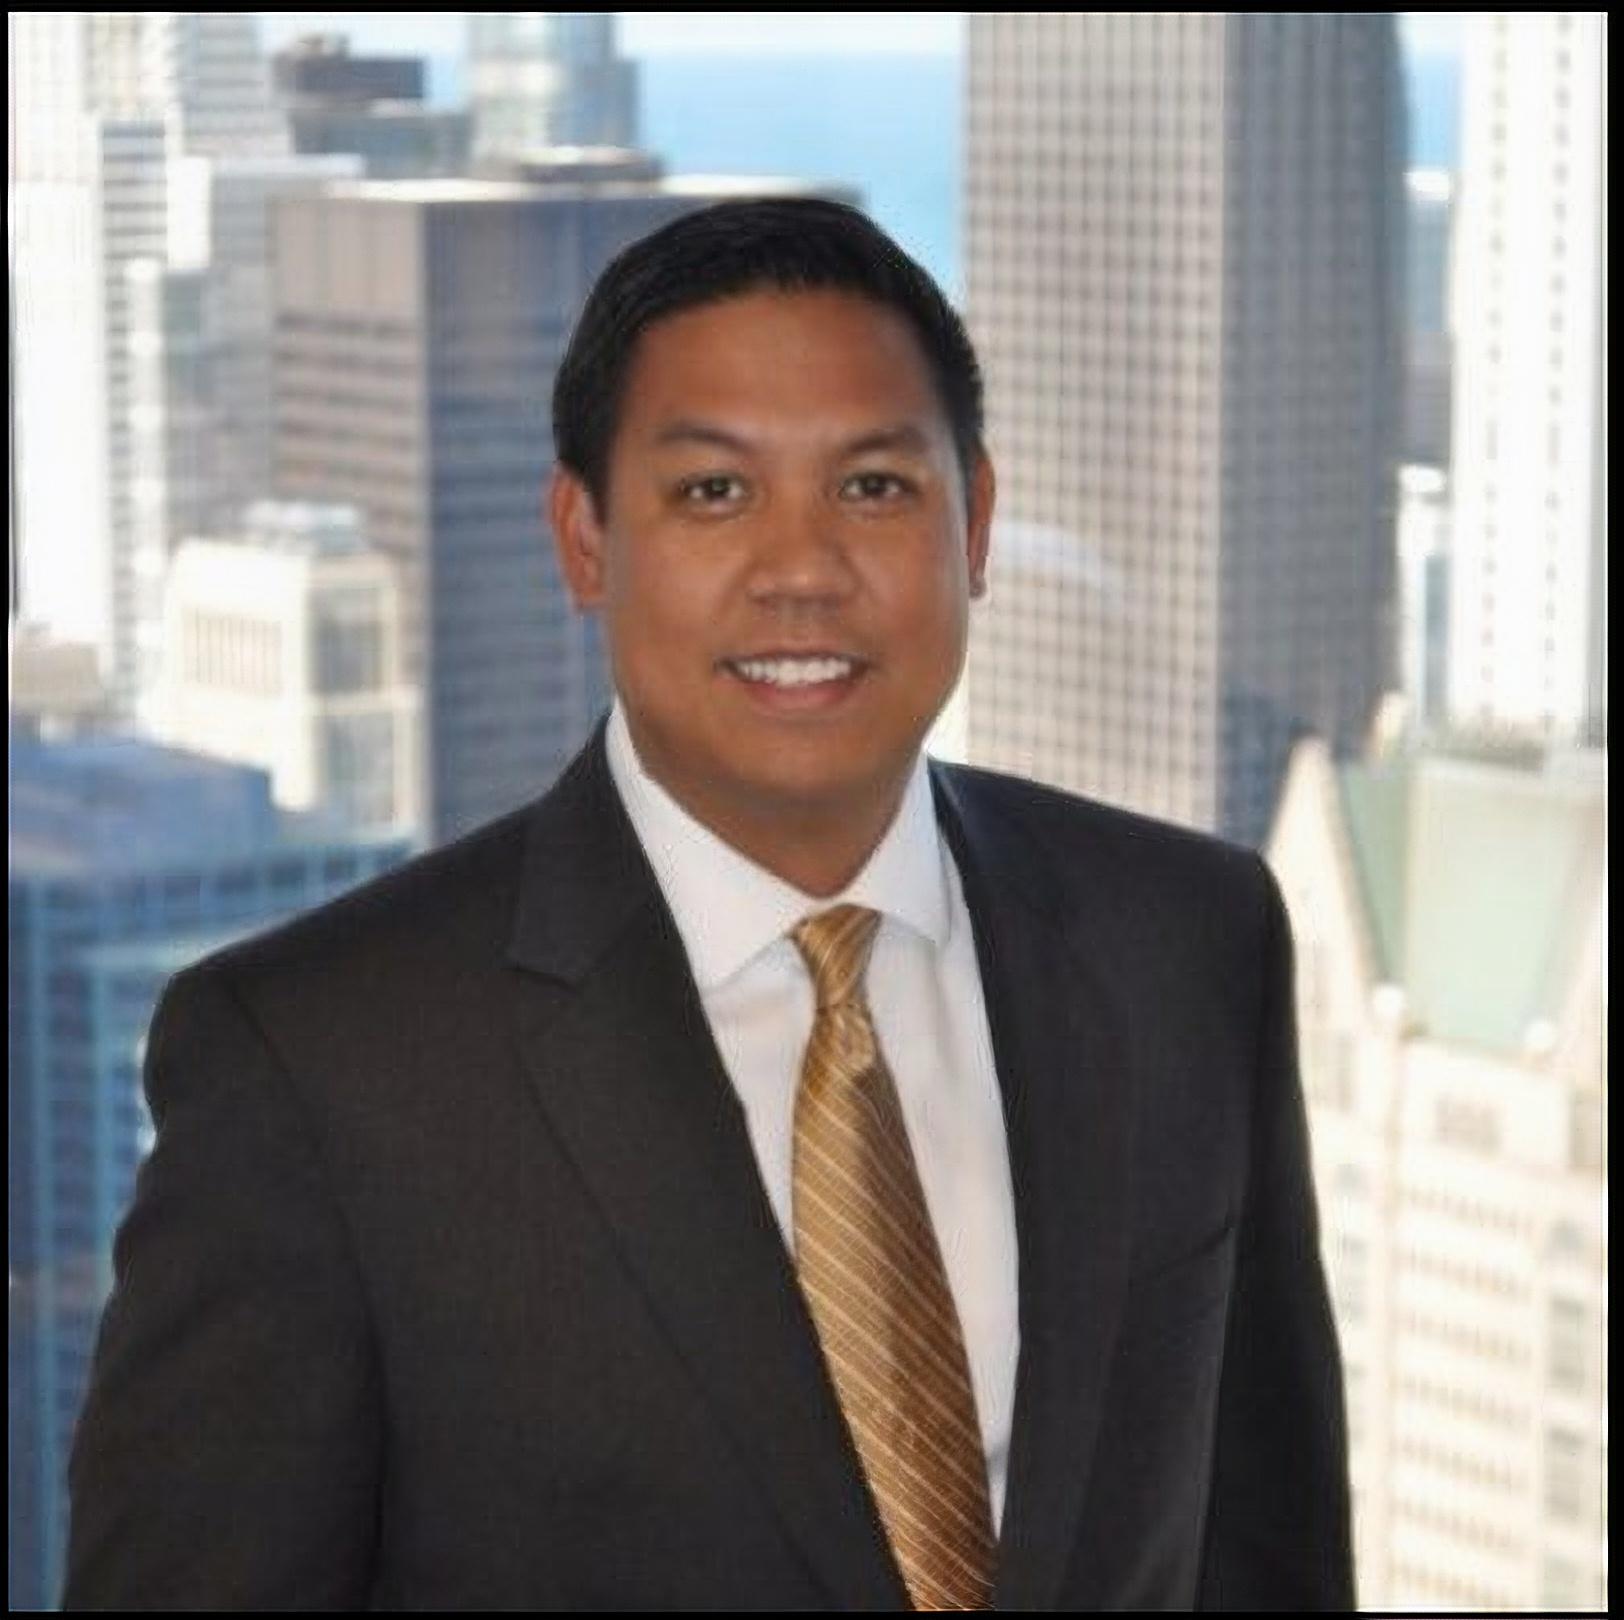 Gary Dennison, CEO of Equiti US